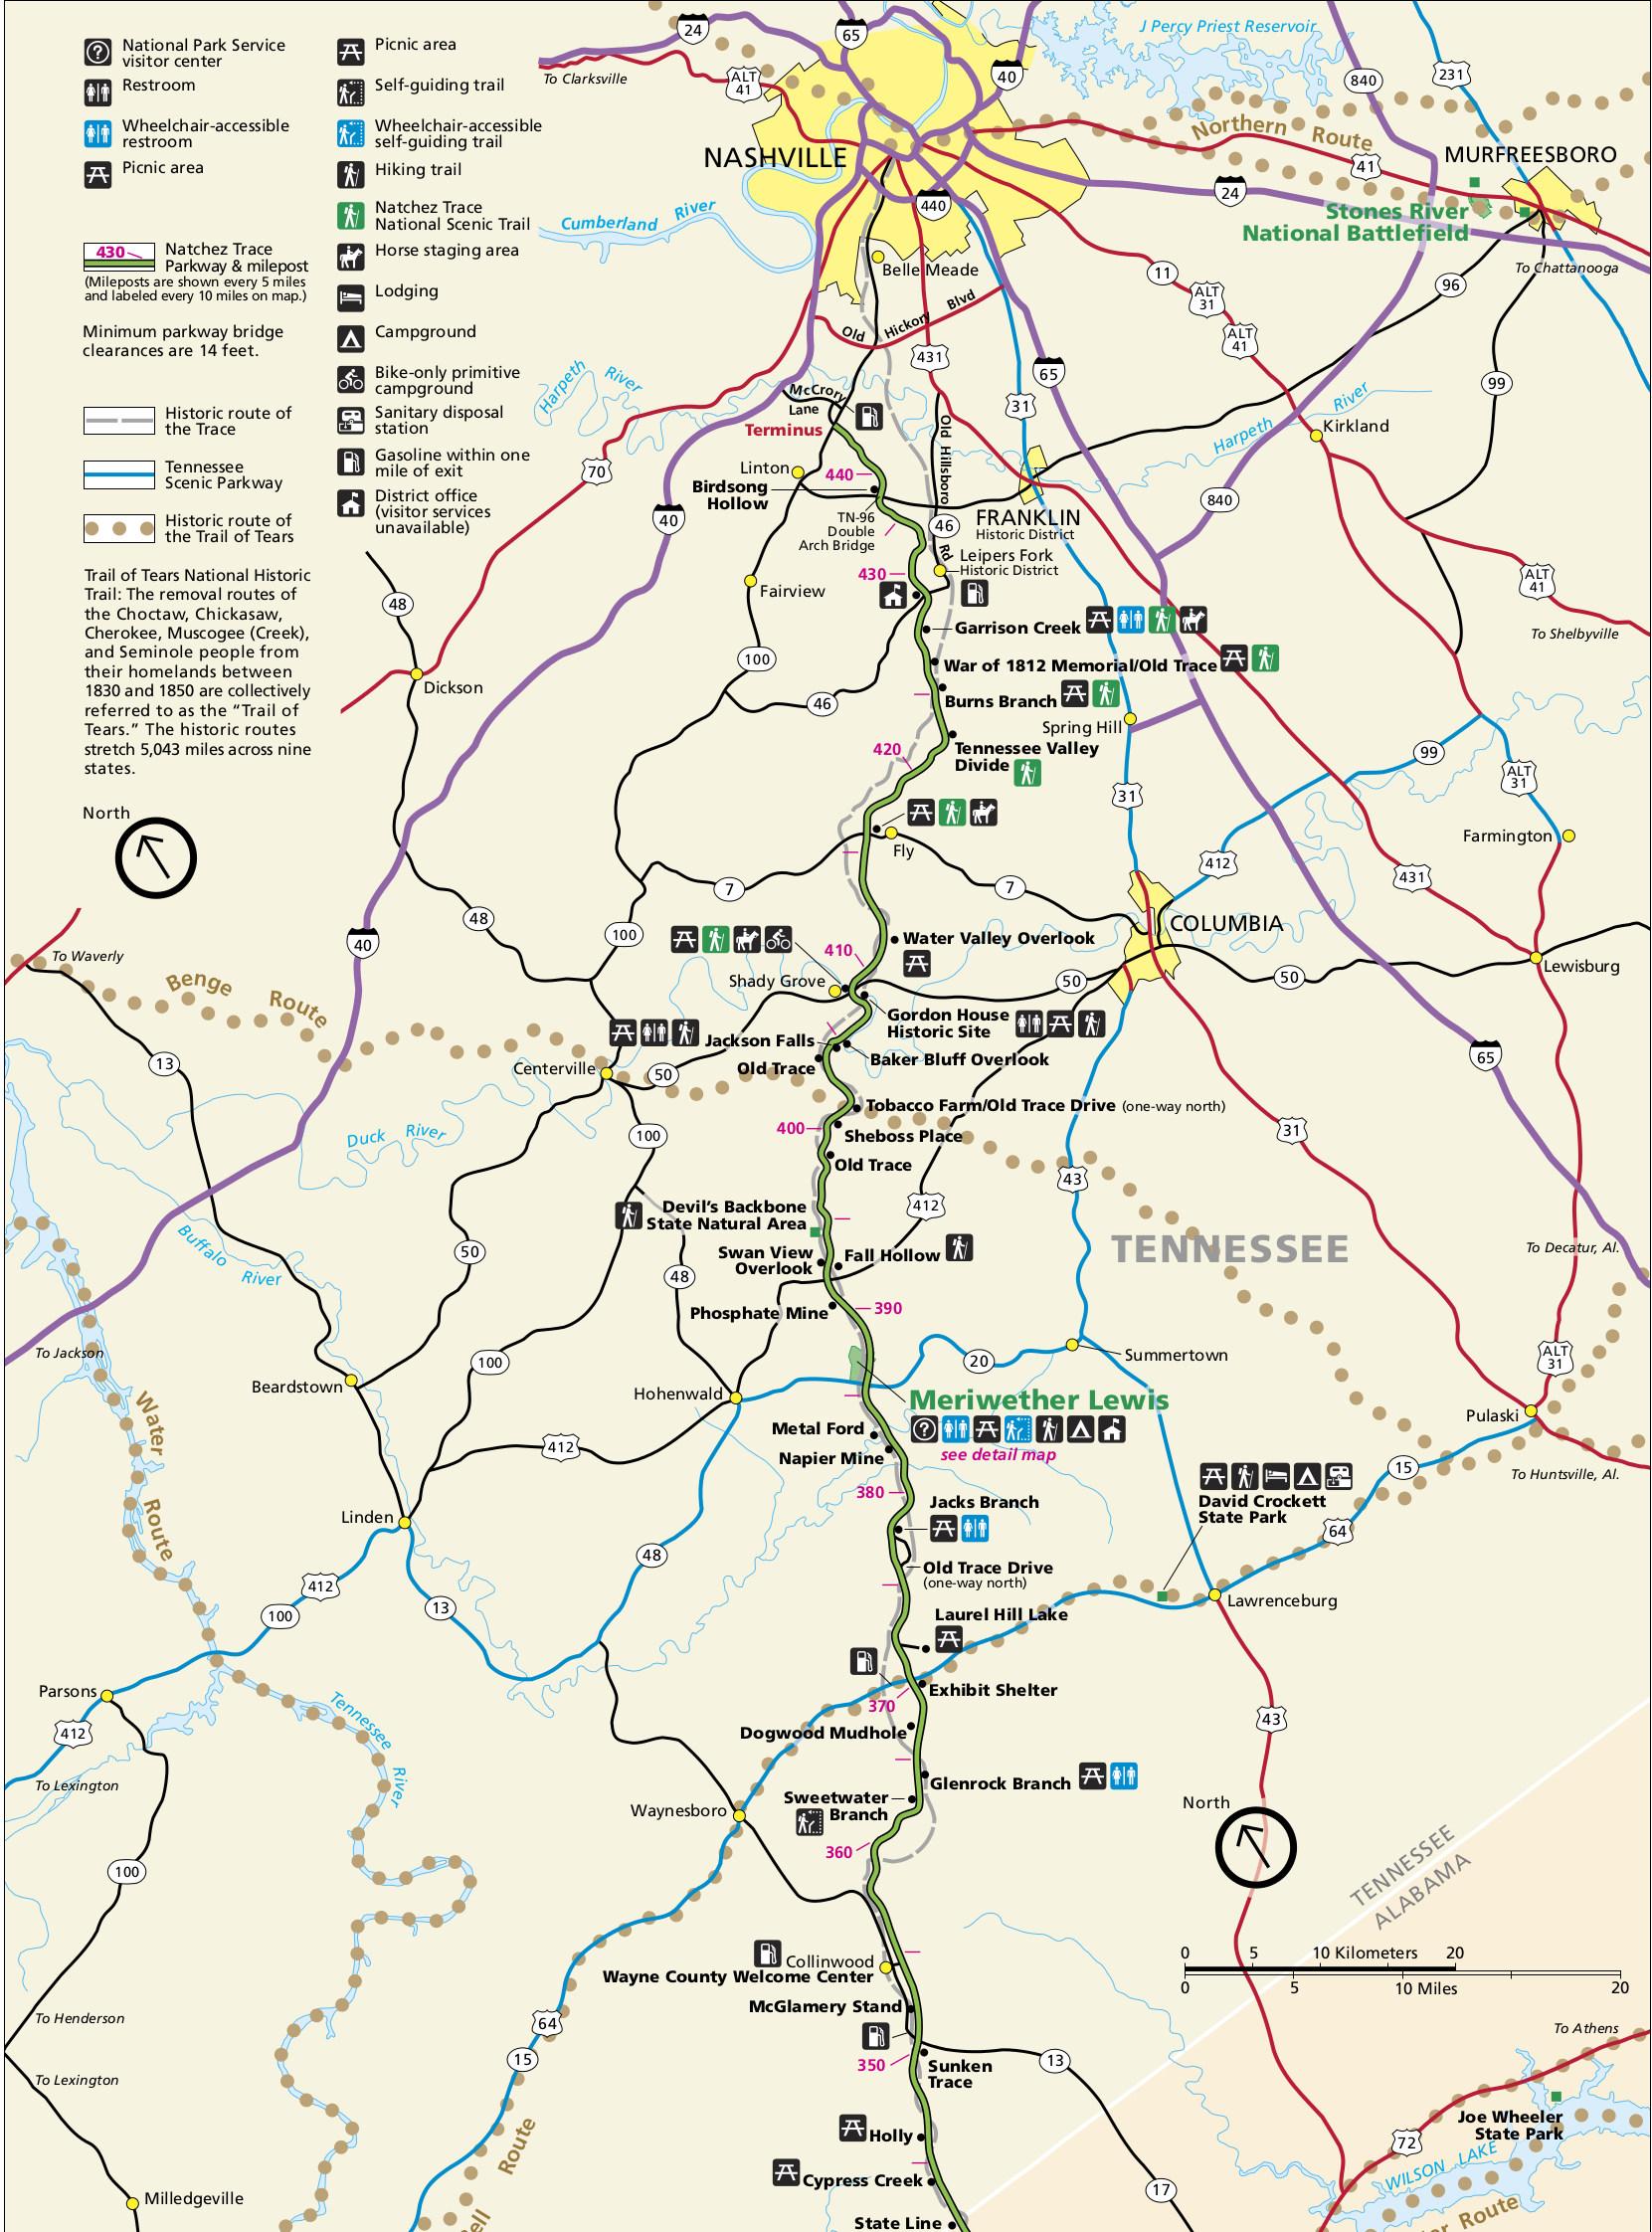 File Nps Natchez Trace4 Tennessee Jpg Wikimedia Commons